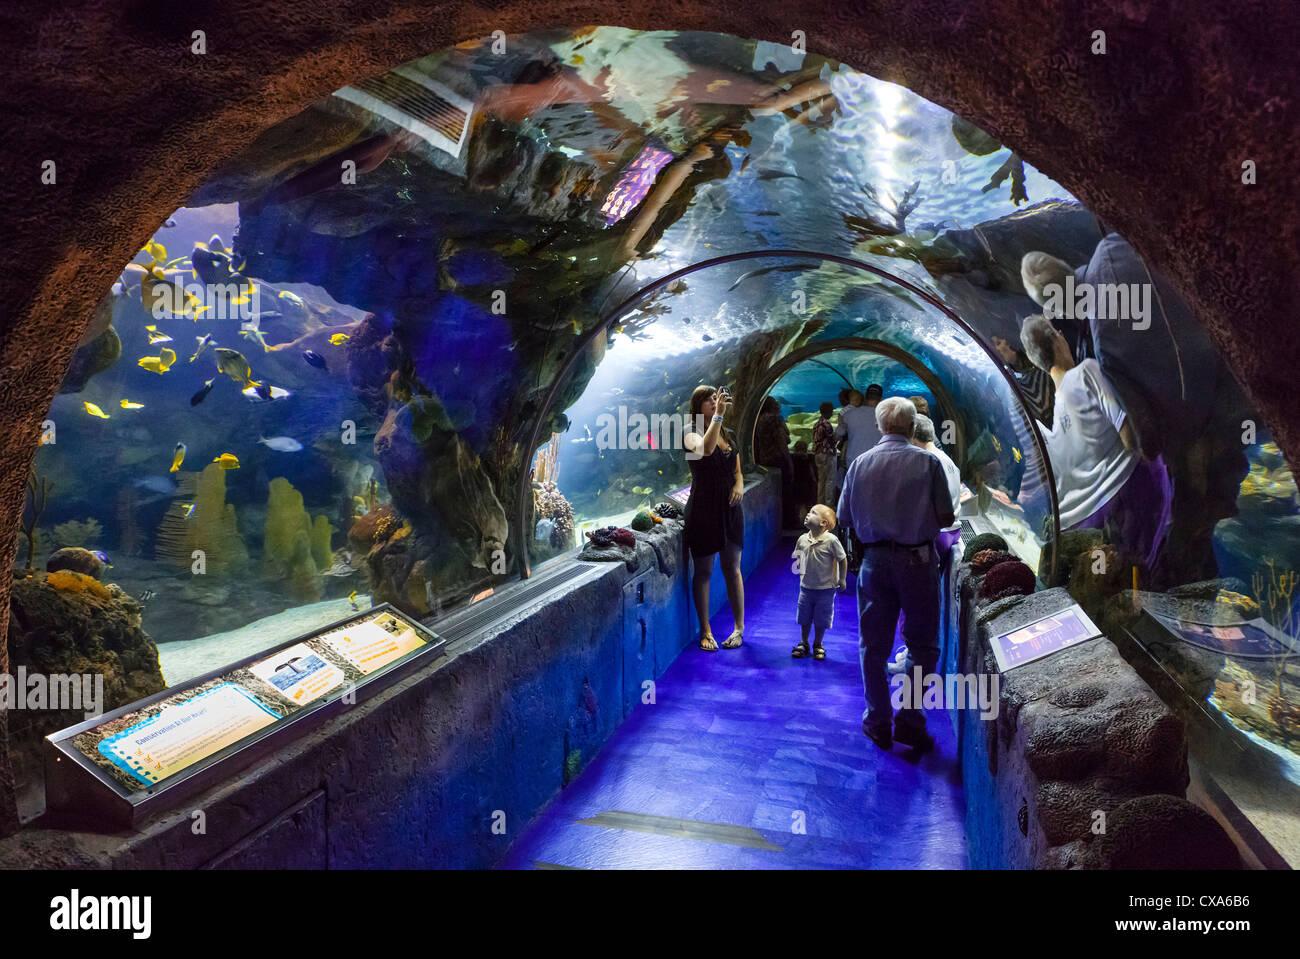 Sea Life Aquarium in the Mall of America, Bloomington, Minneapolis, Minnesota, USA - Stock Image